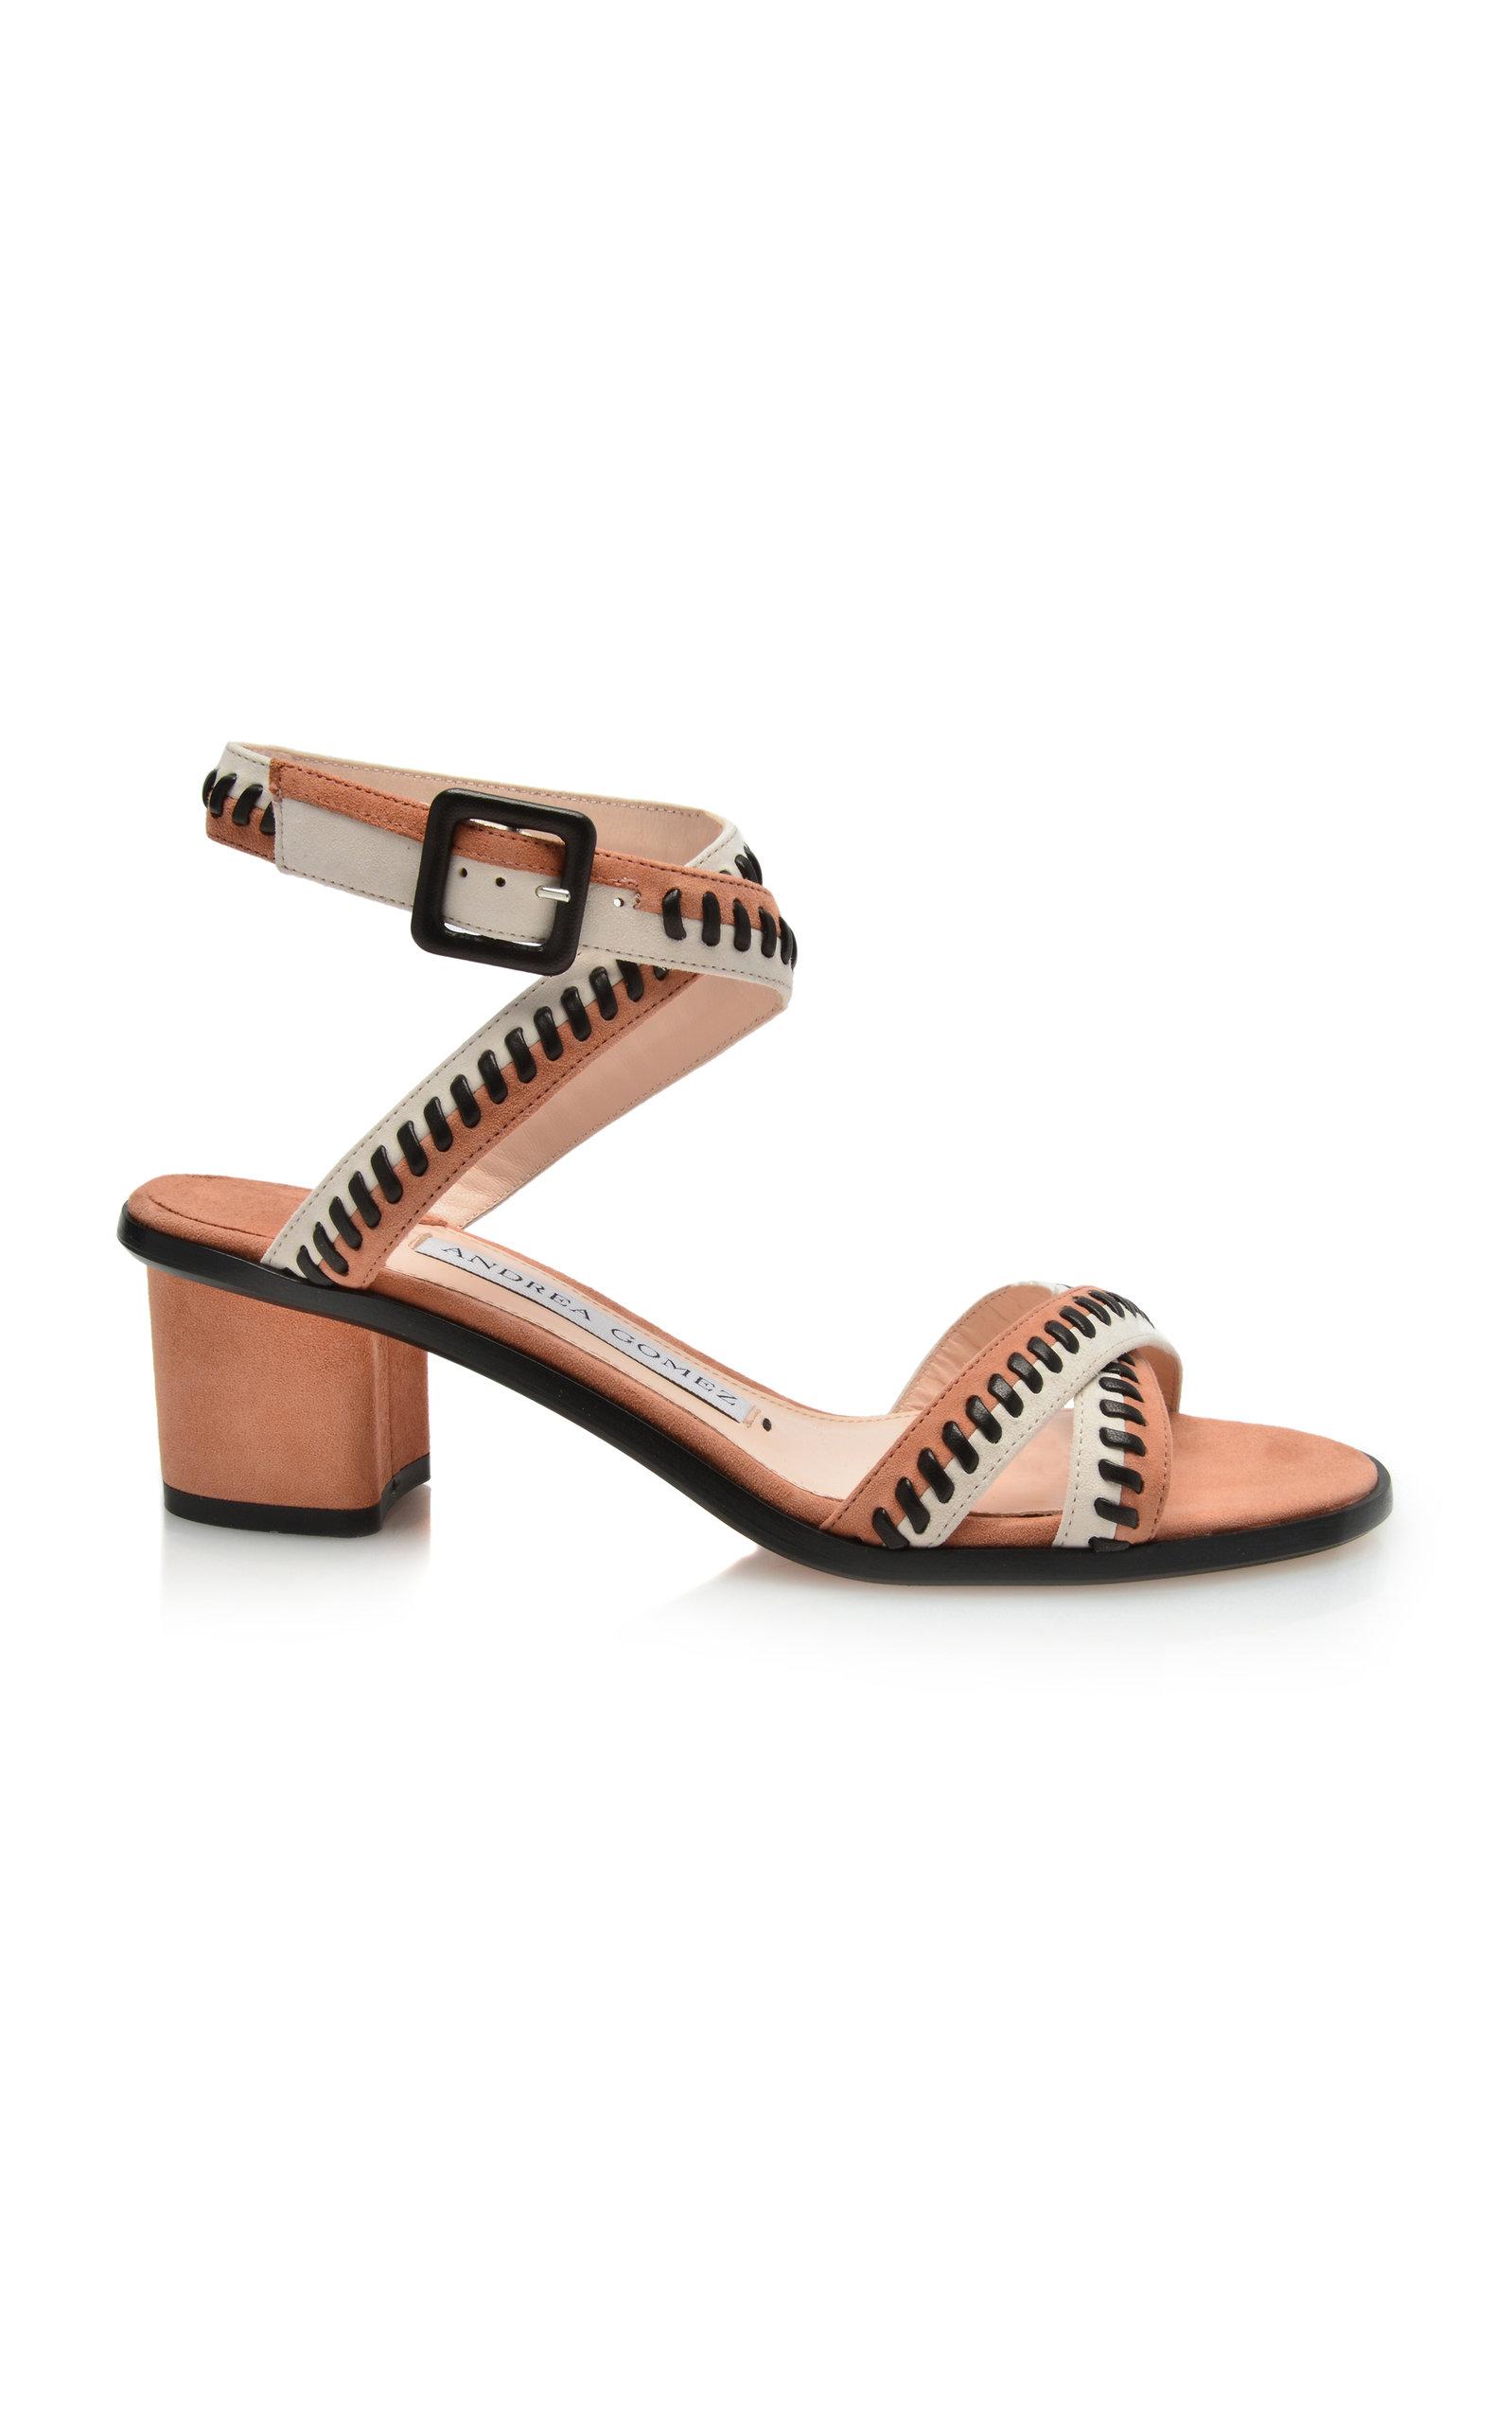 ANDREA GOMEZ Bea Block Sandal in Pink